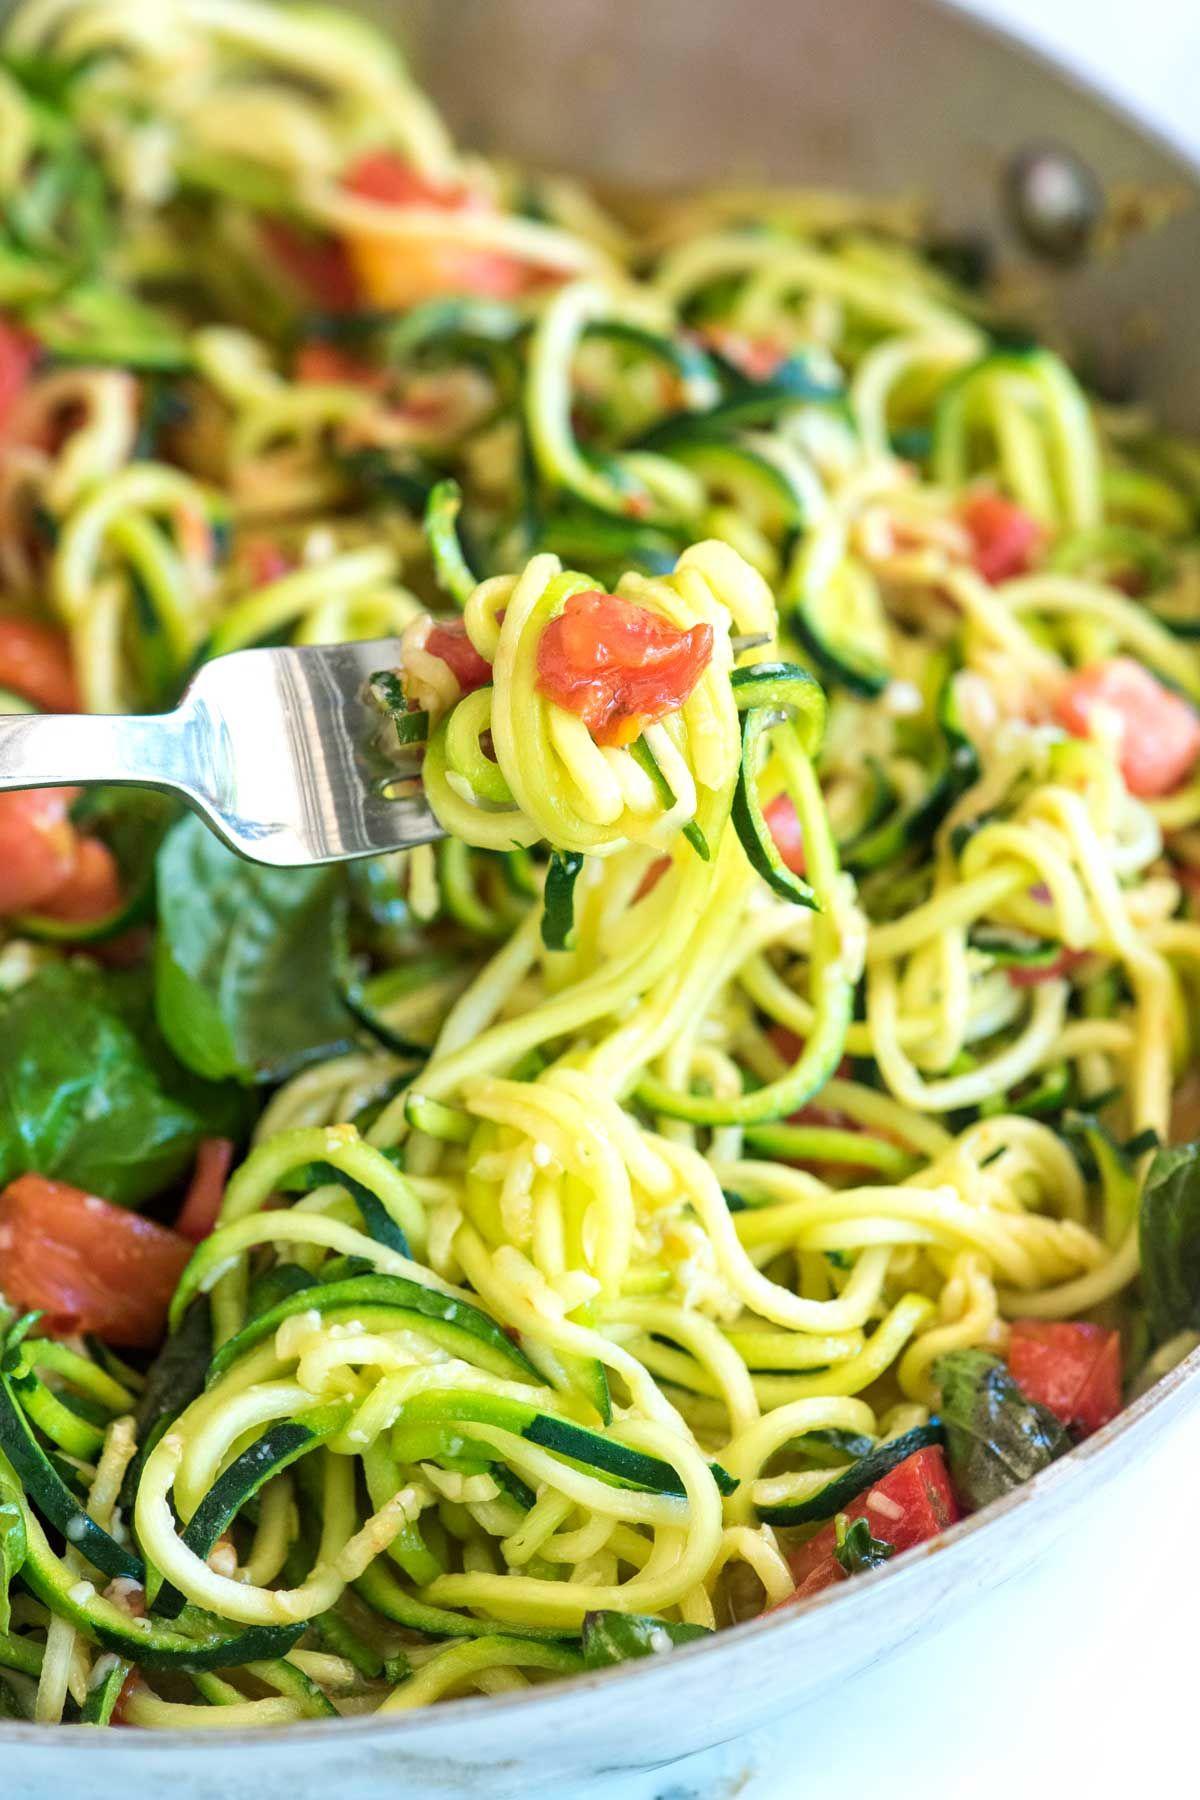 Guilt Free Garlic Parmesan Zucchini Noodles Pasta Recipe